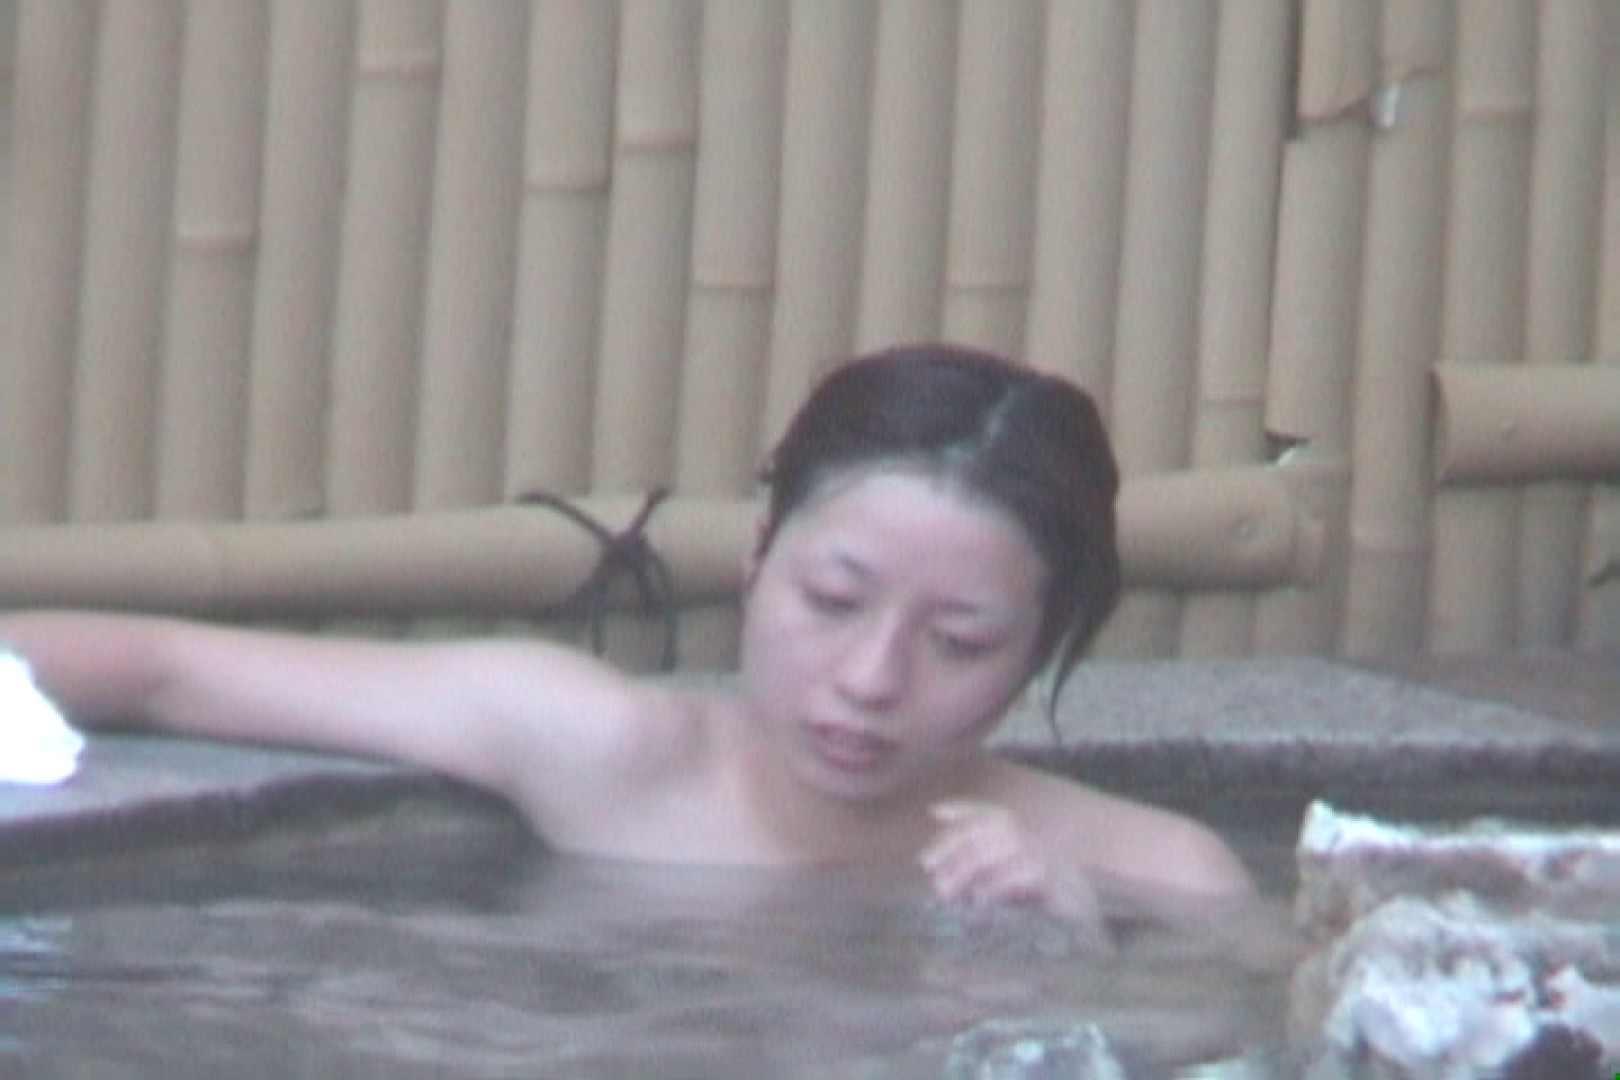 Aquaな露天風呂Vol.608 露天風呂 | OLのエロ生活  69連発 49